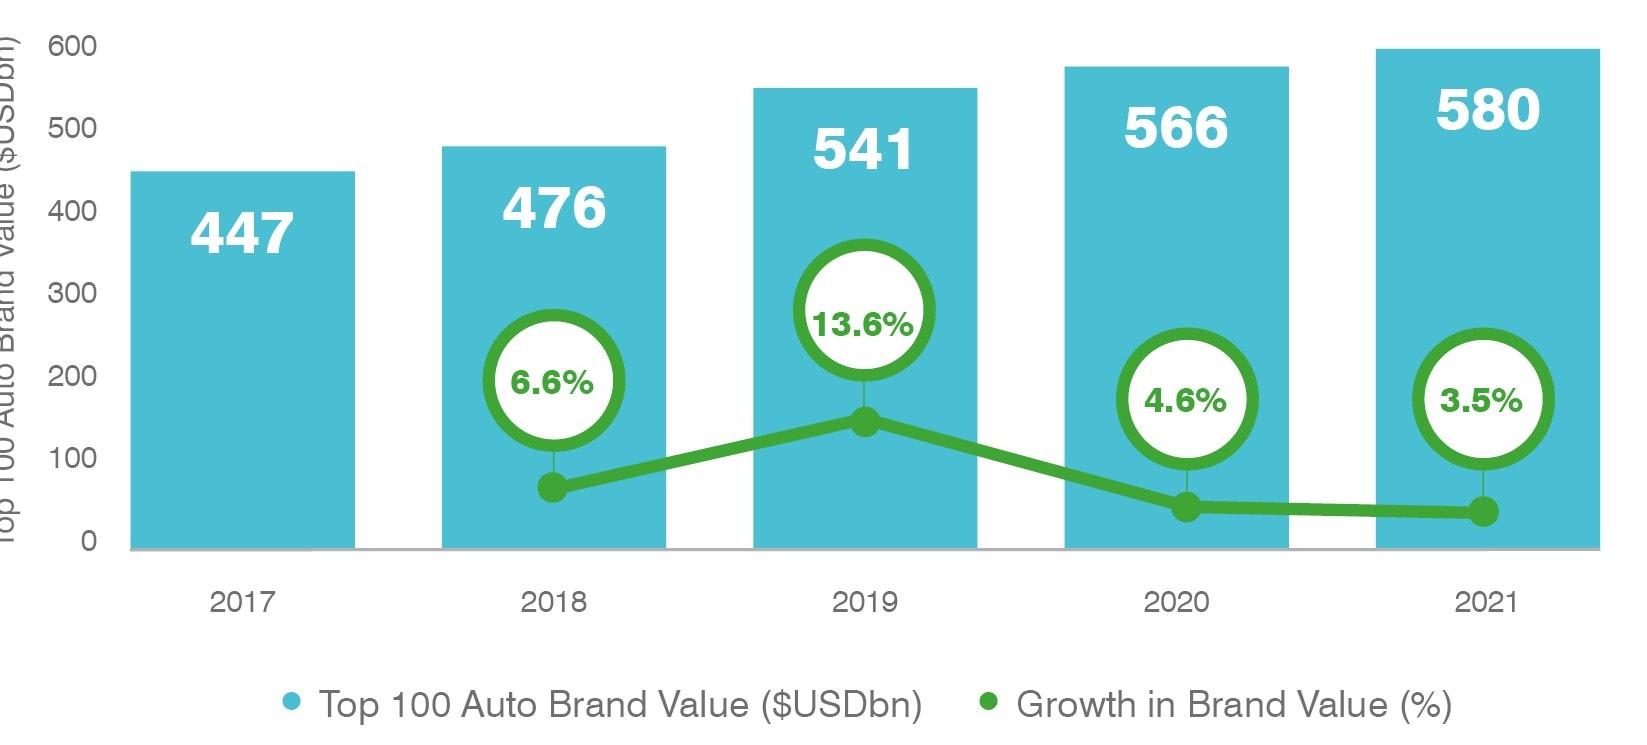 Brand Finance's Top 100 Automobile Brands 2017-2021